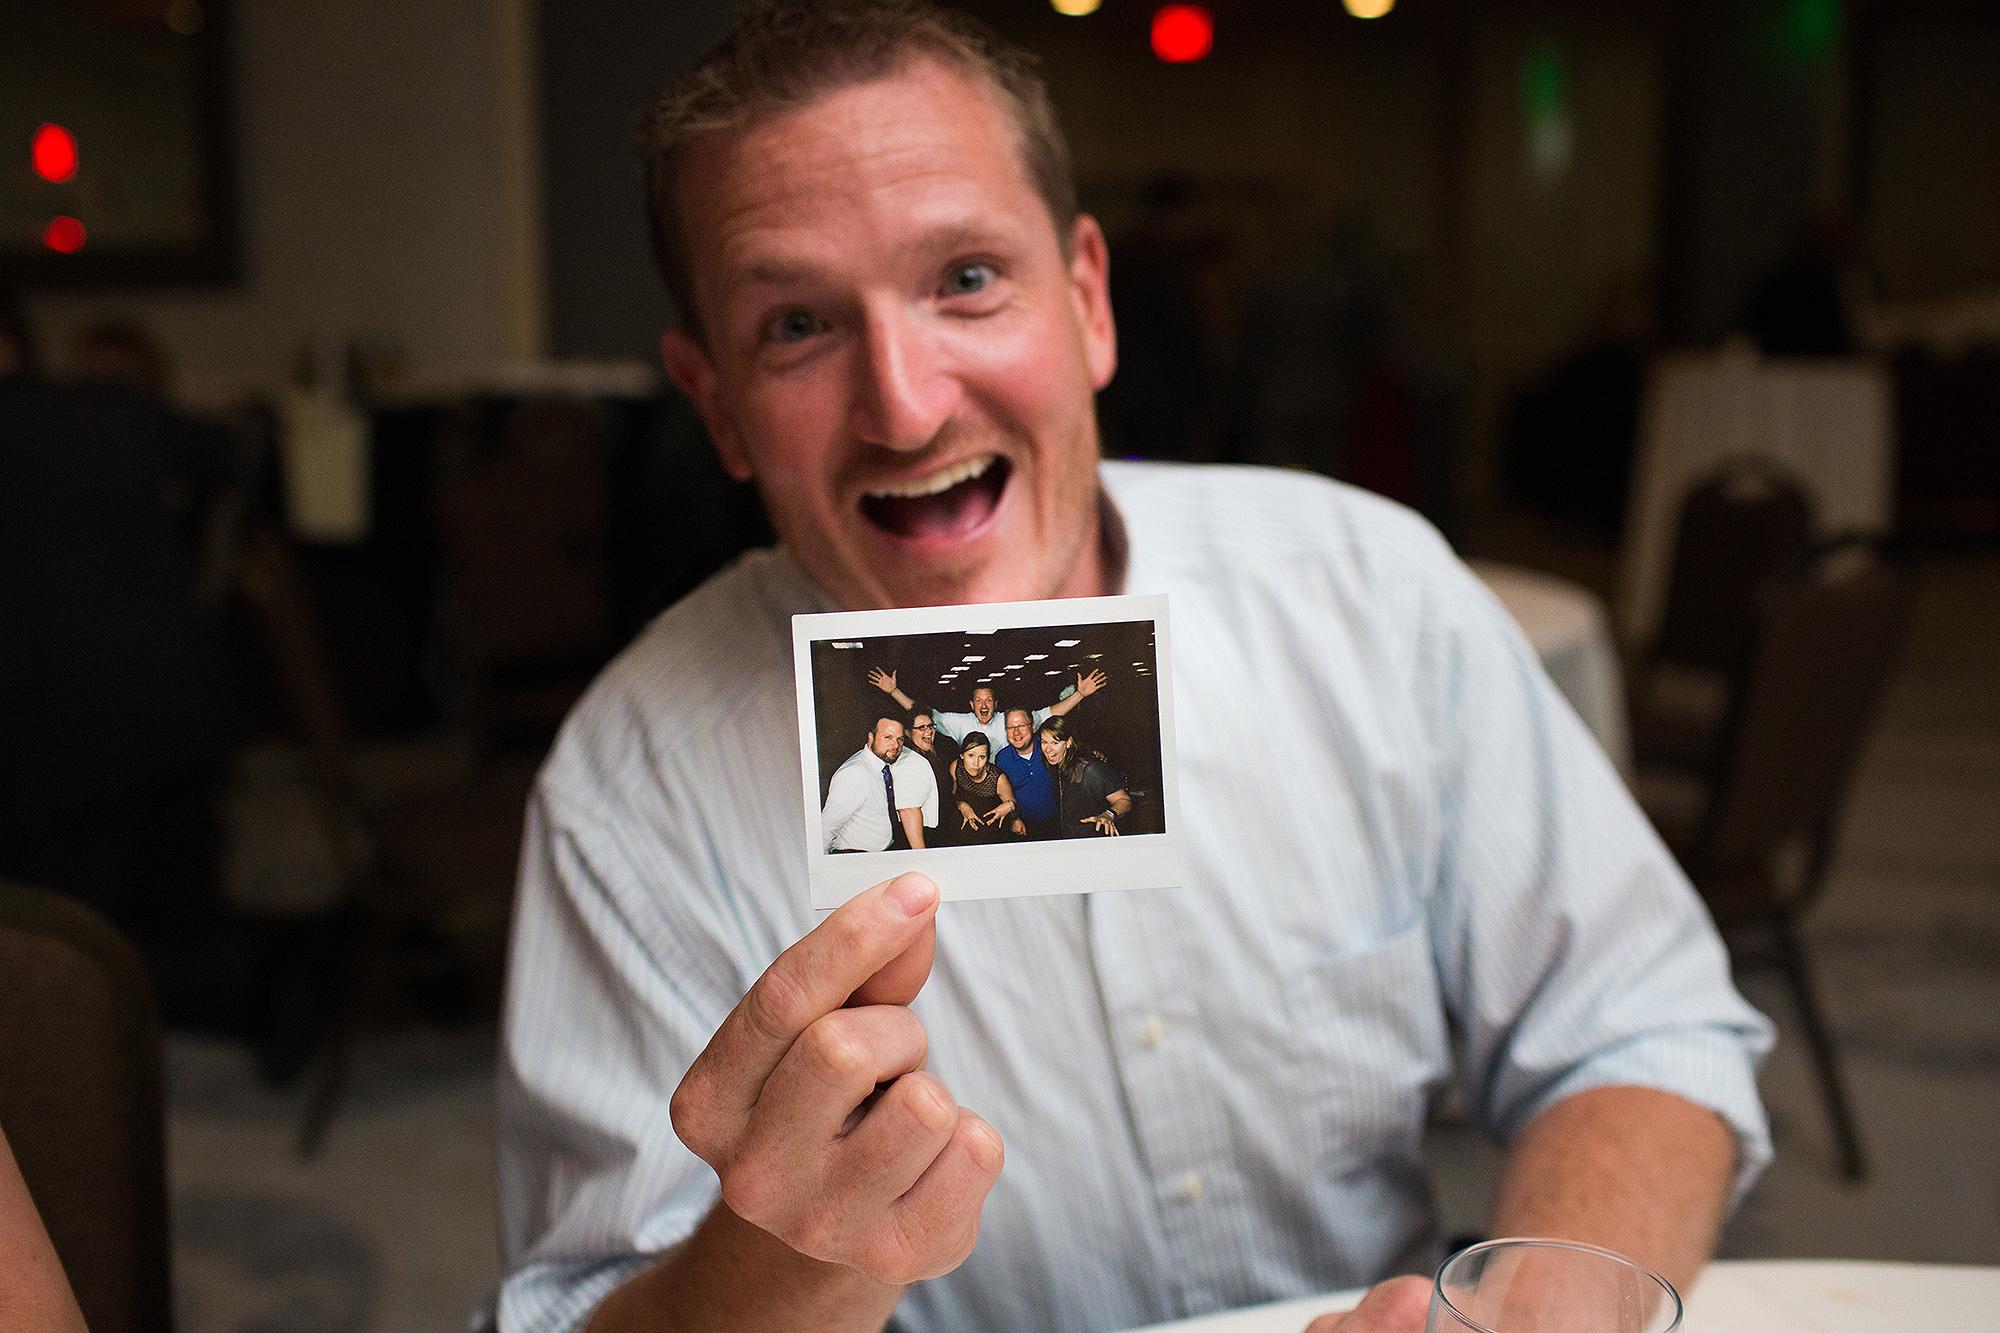 8-excited-guy-with-sarah-corbett-photography-polaroids.jpg